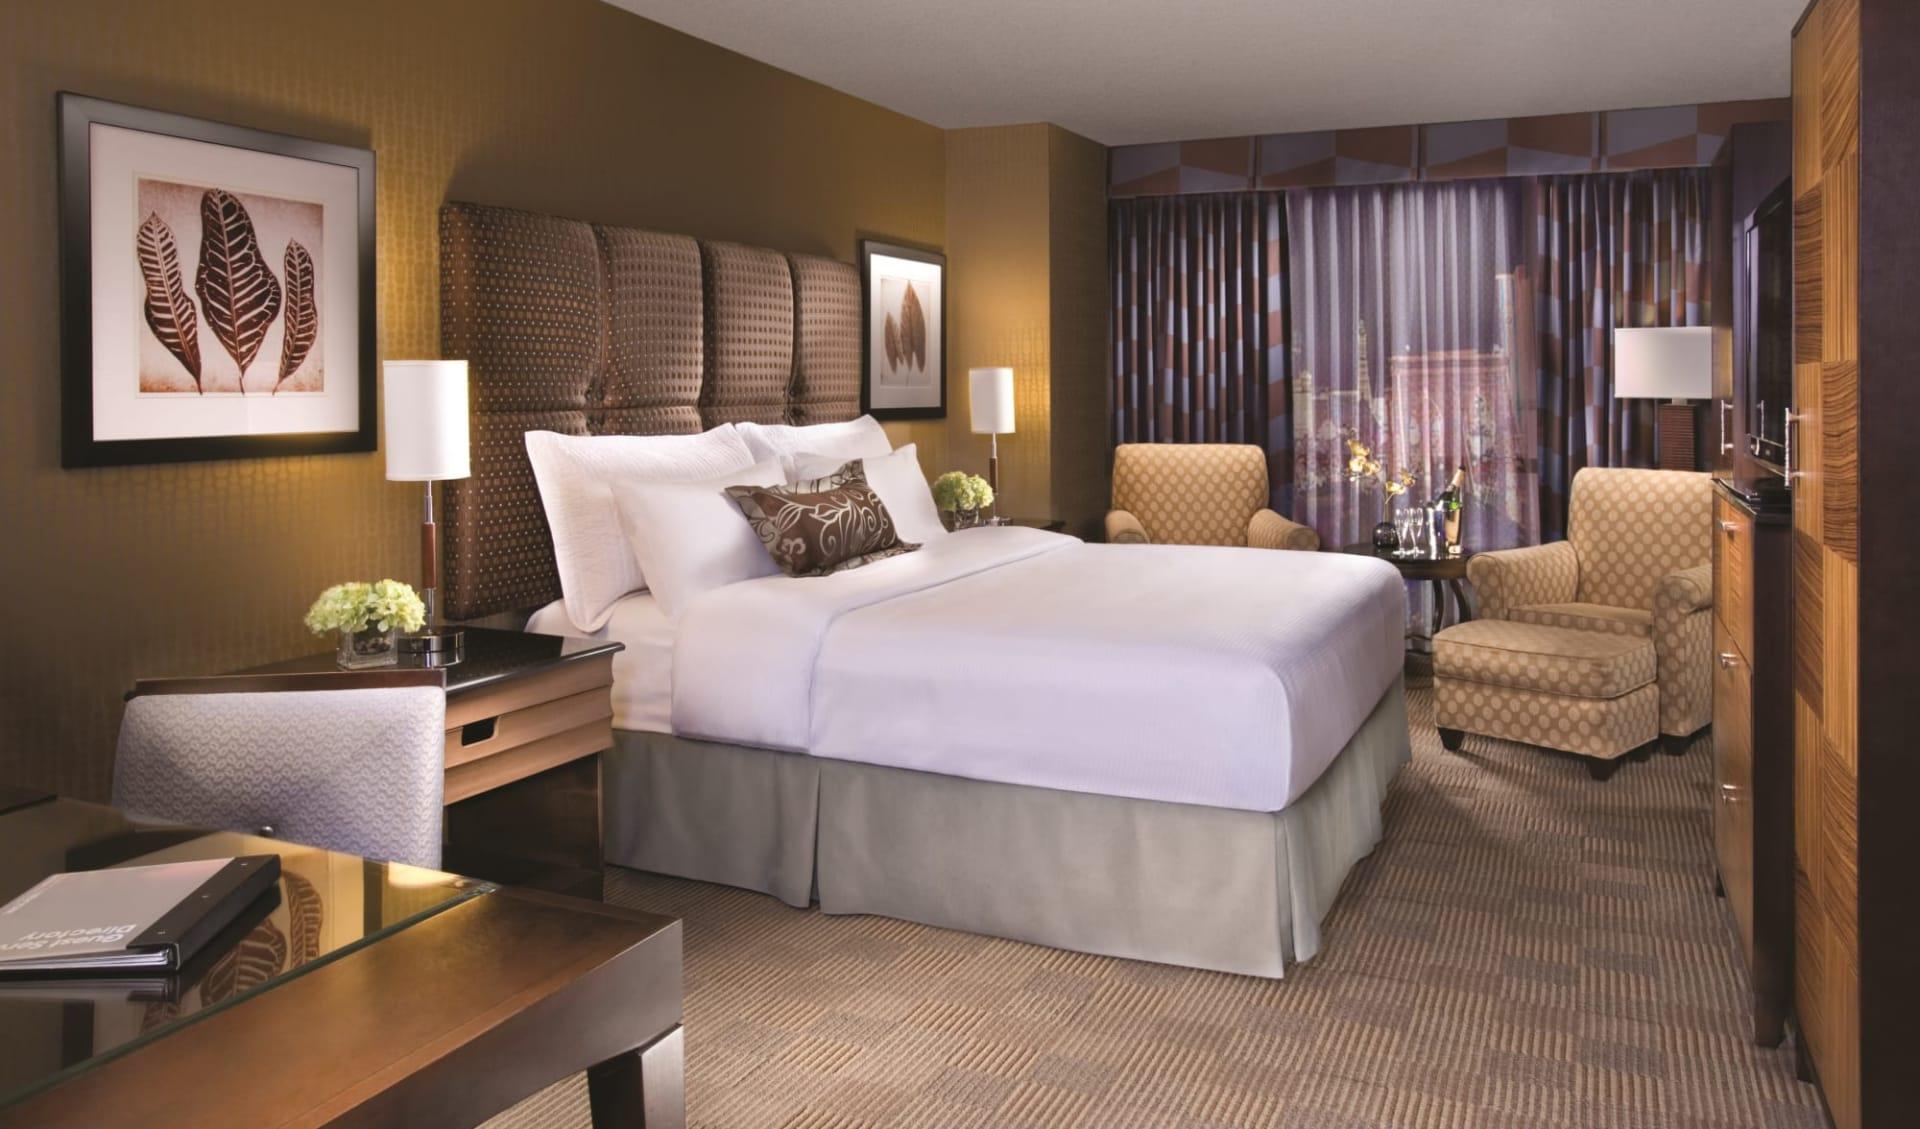 New York New York in Las Vegas:  New York New York - Park Avenue Room